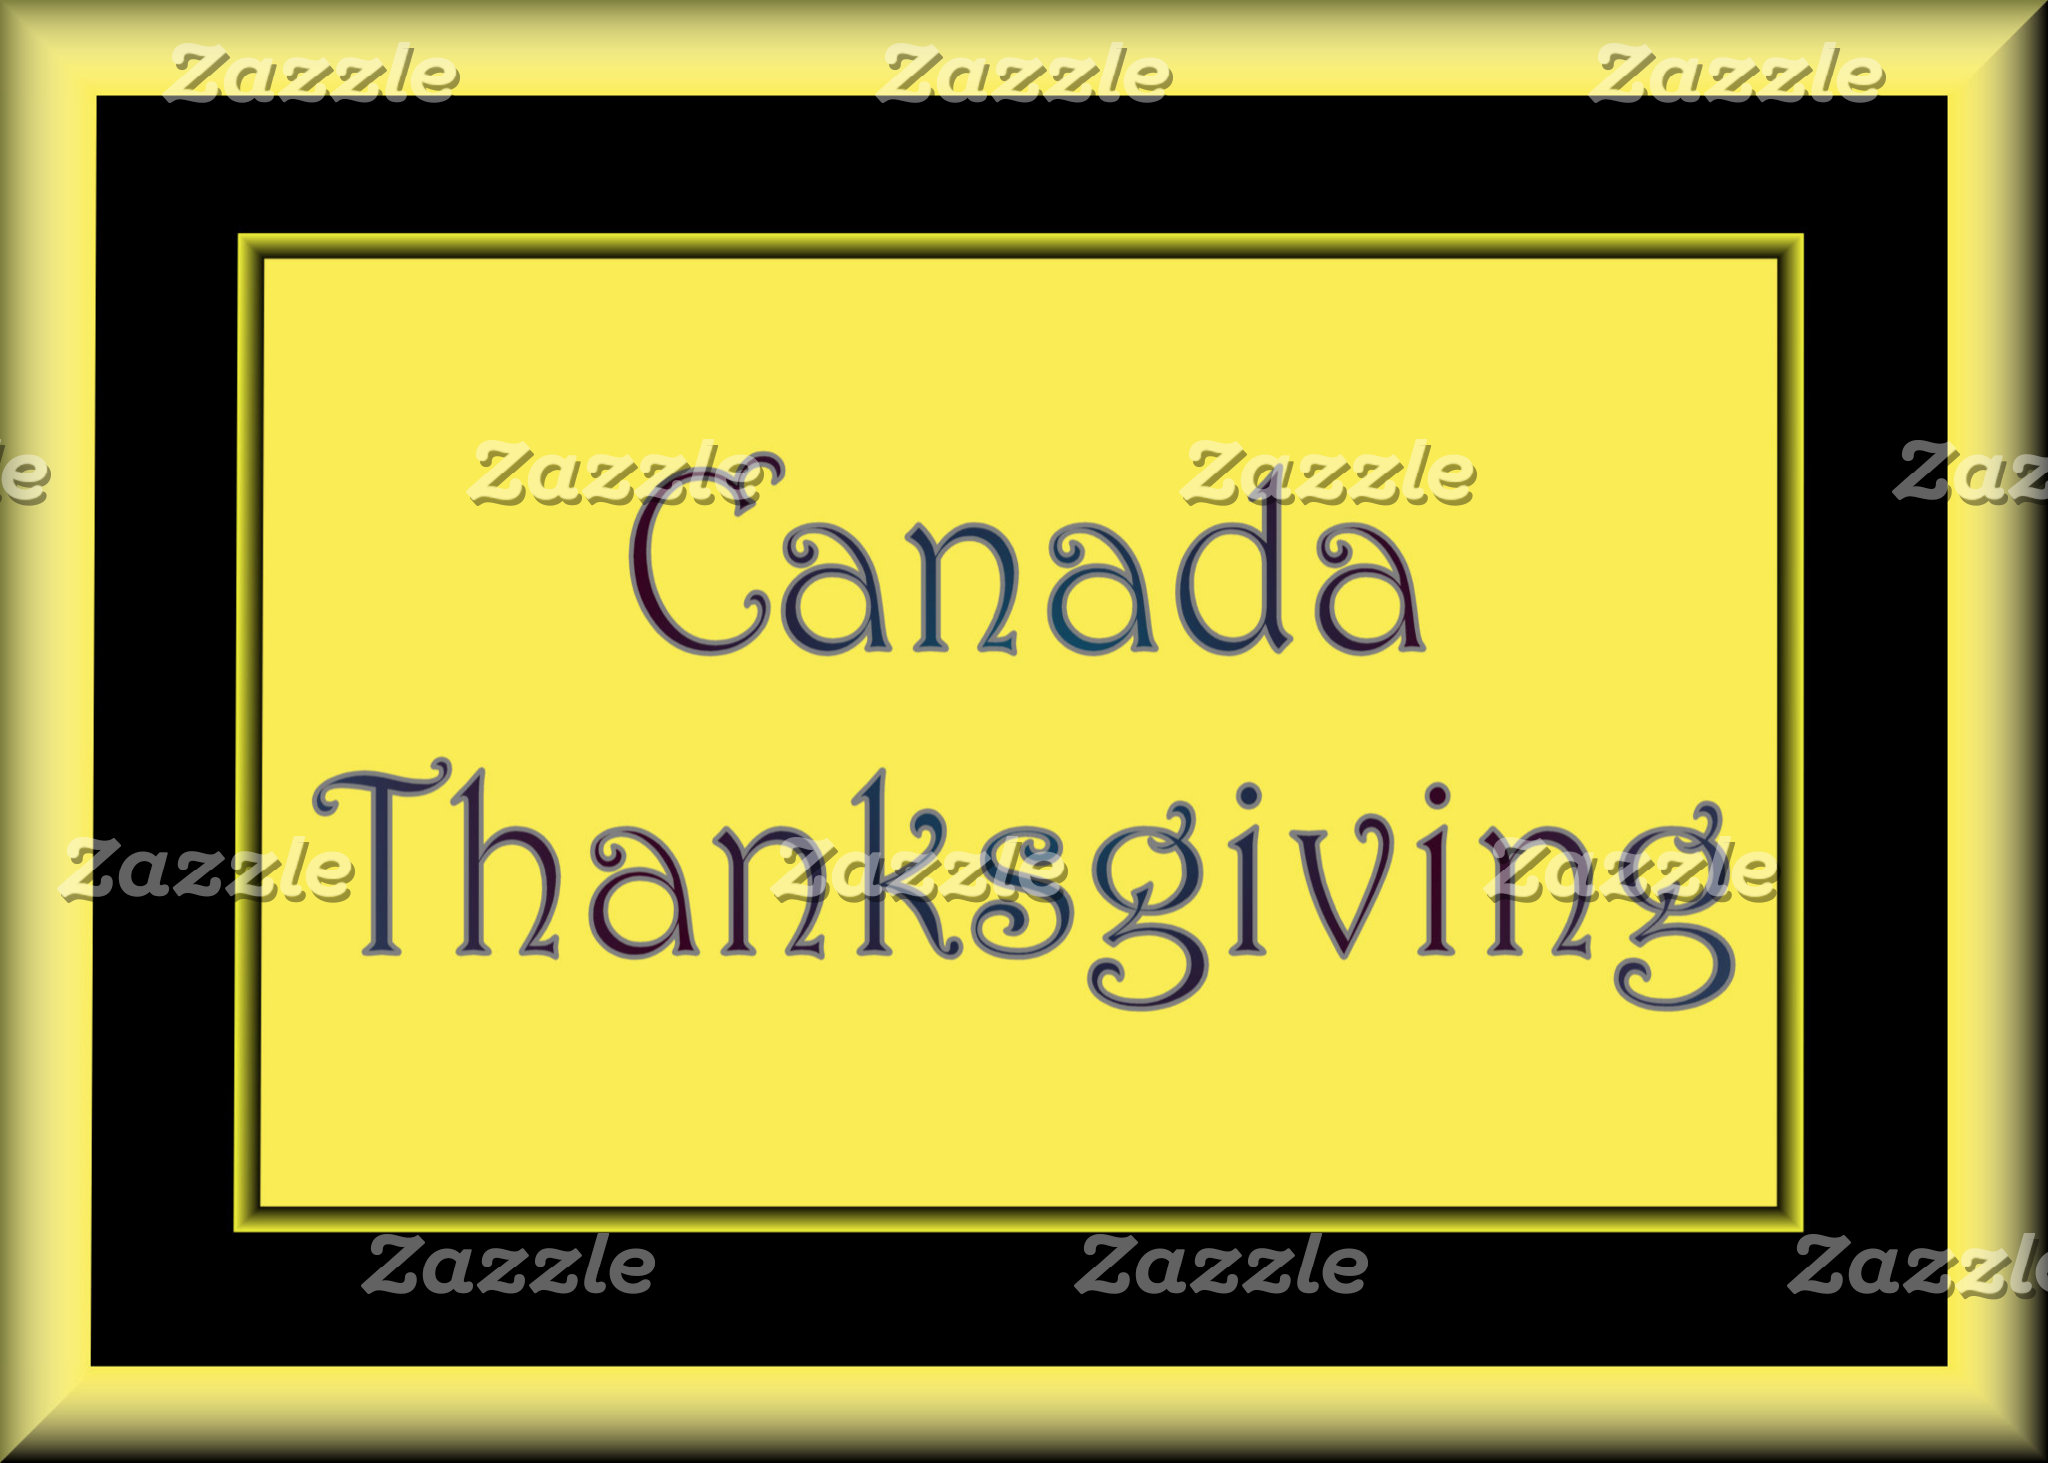 CANADA -  CANADA DAY - THANKSGIVING